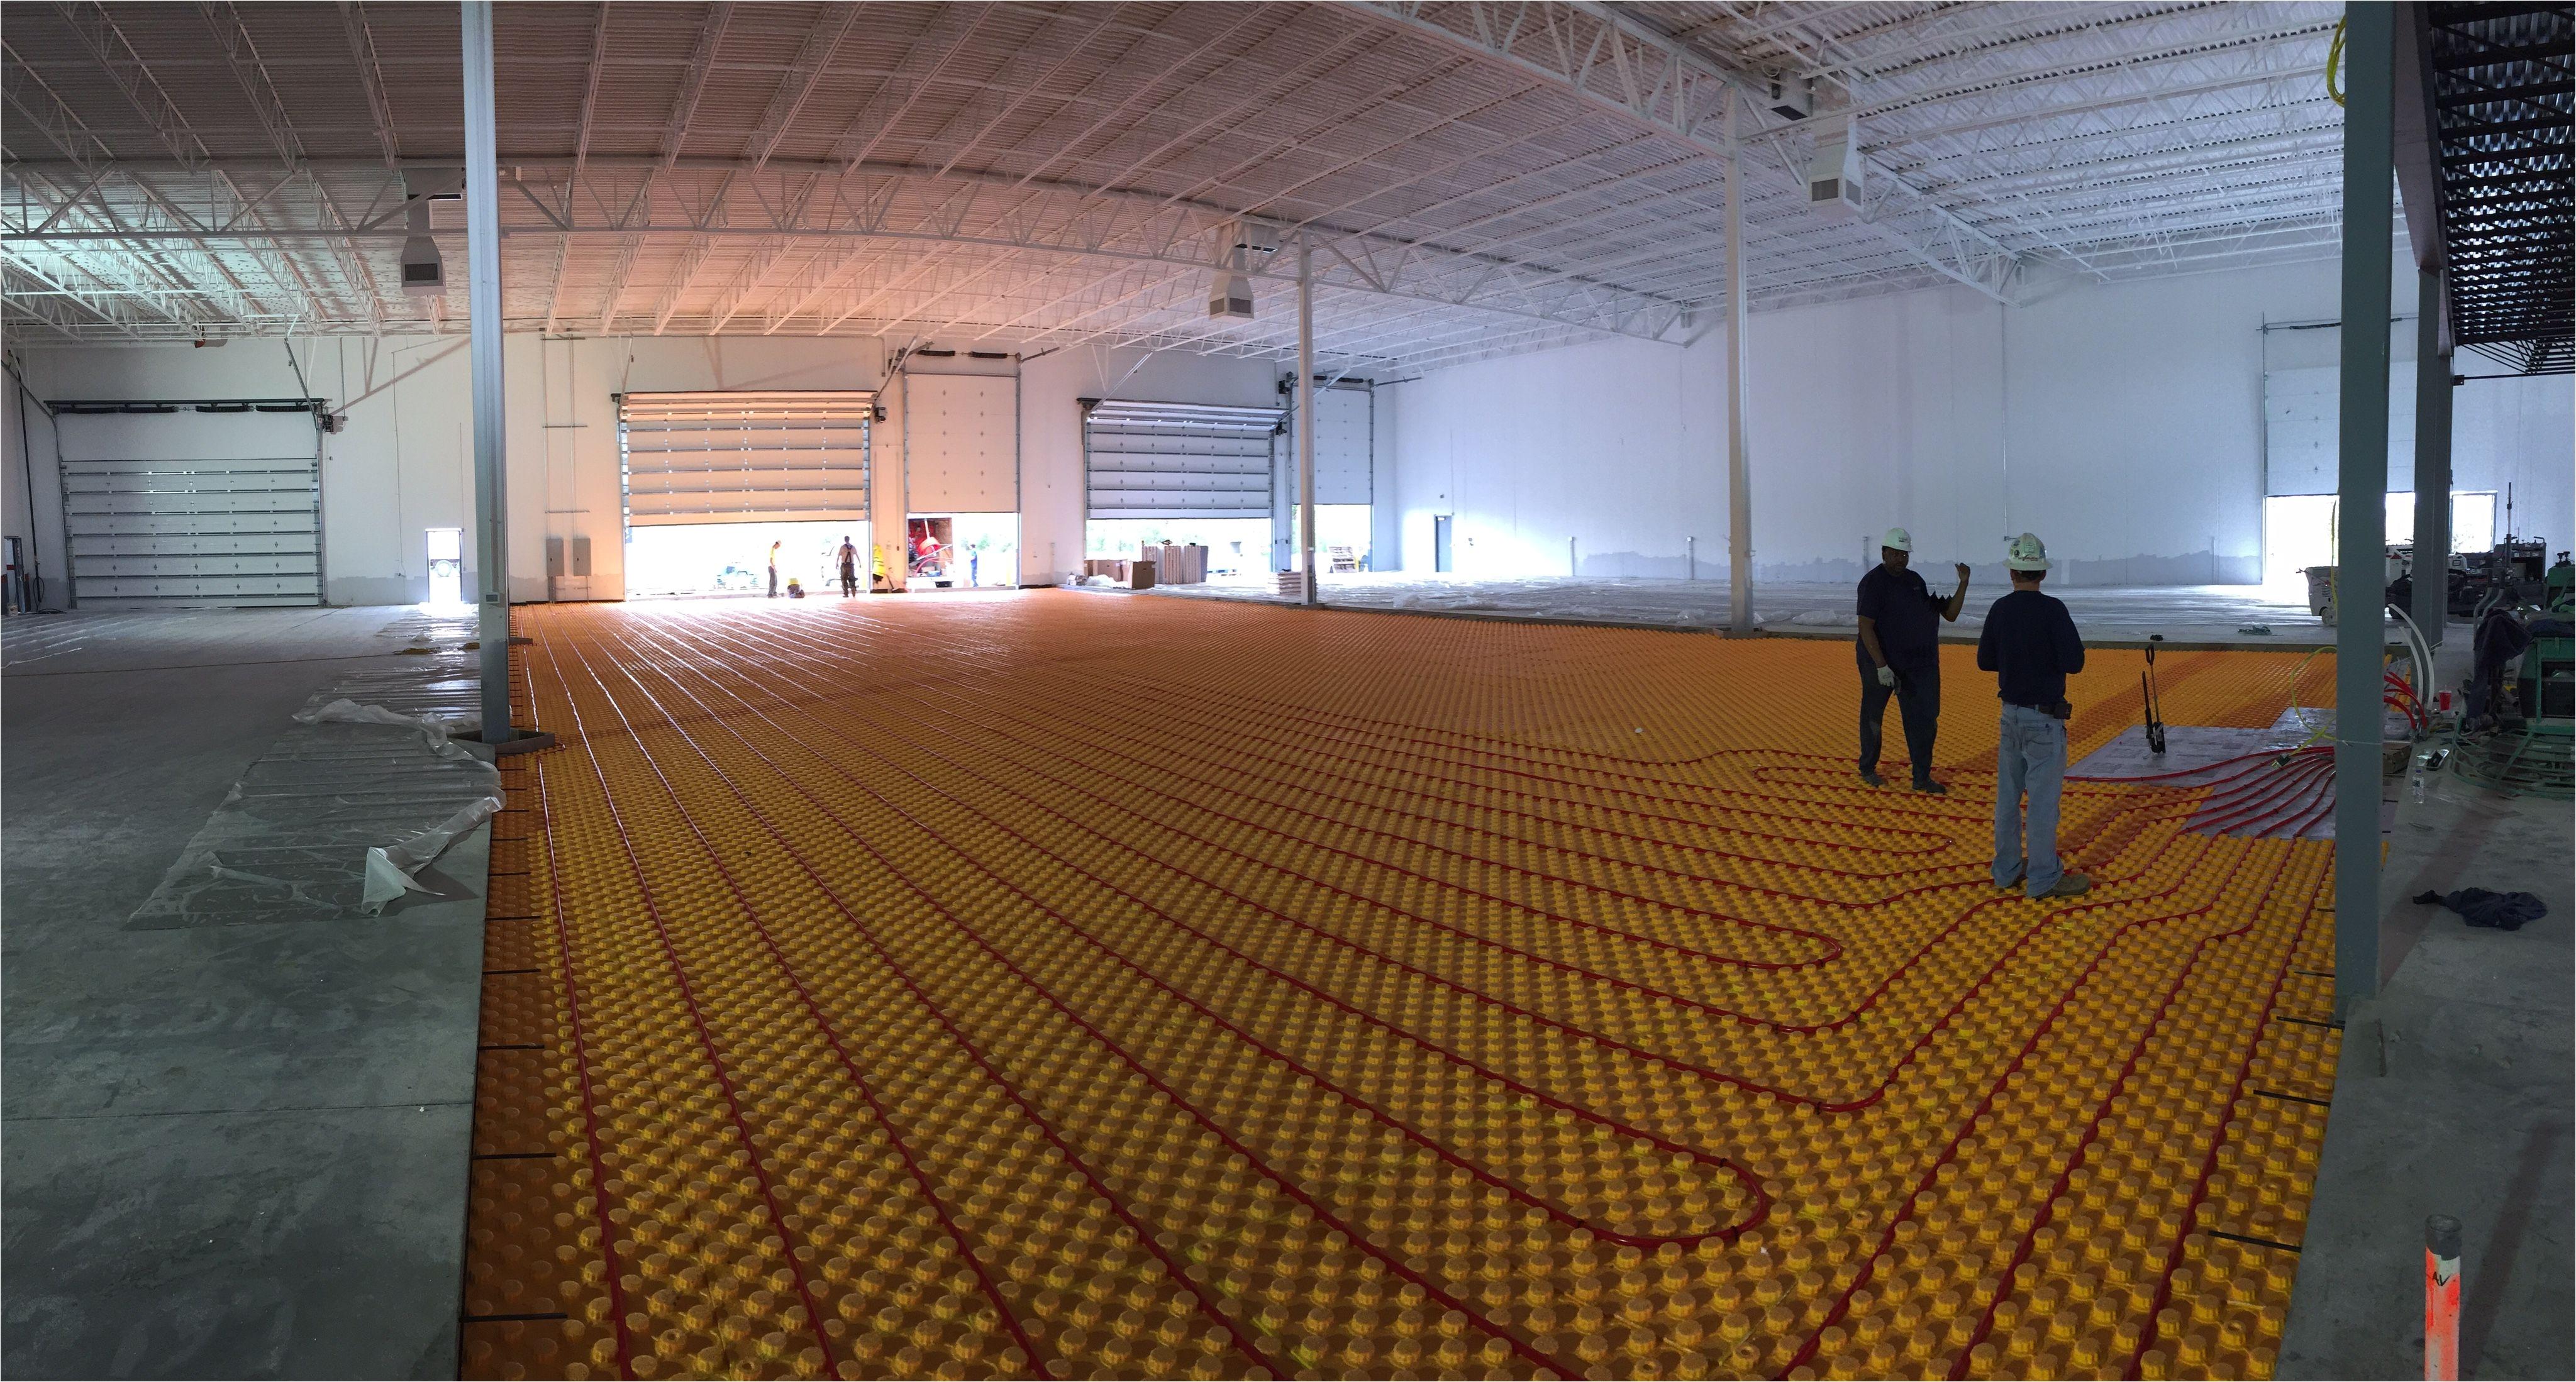 Over Floor Radiant Heat Panels Creatherm Radiant Floor Heating Panels for Slab On Grade